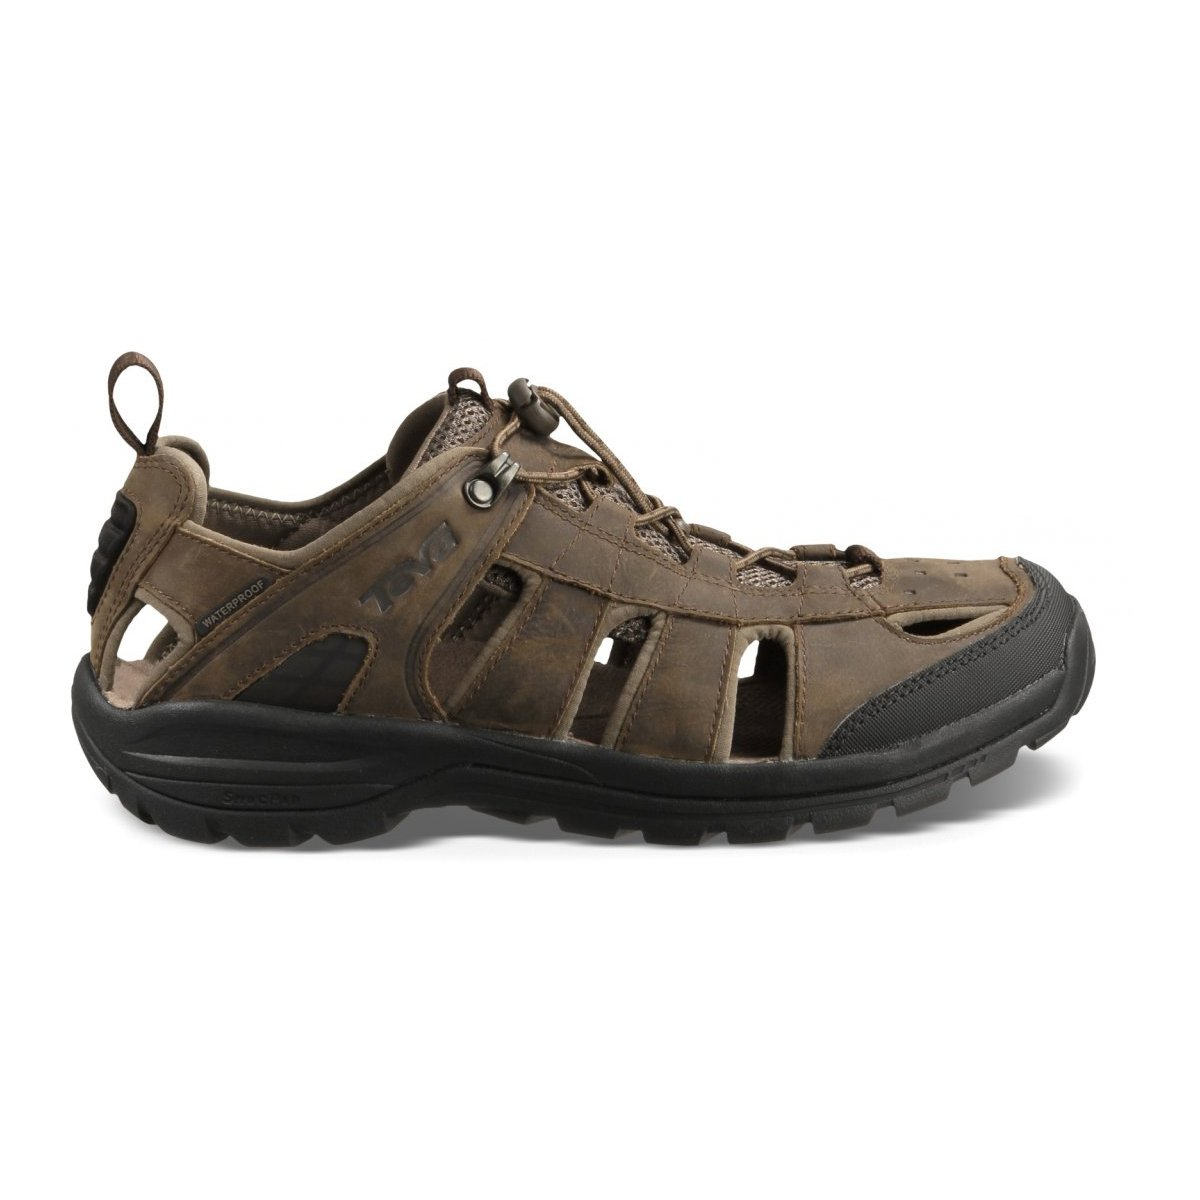 362b94c05728c Teva Kimtah Sandal Leather TE.1003999-TKCF - ParagonShop